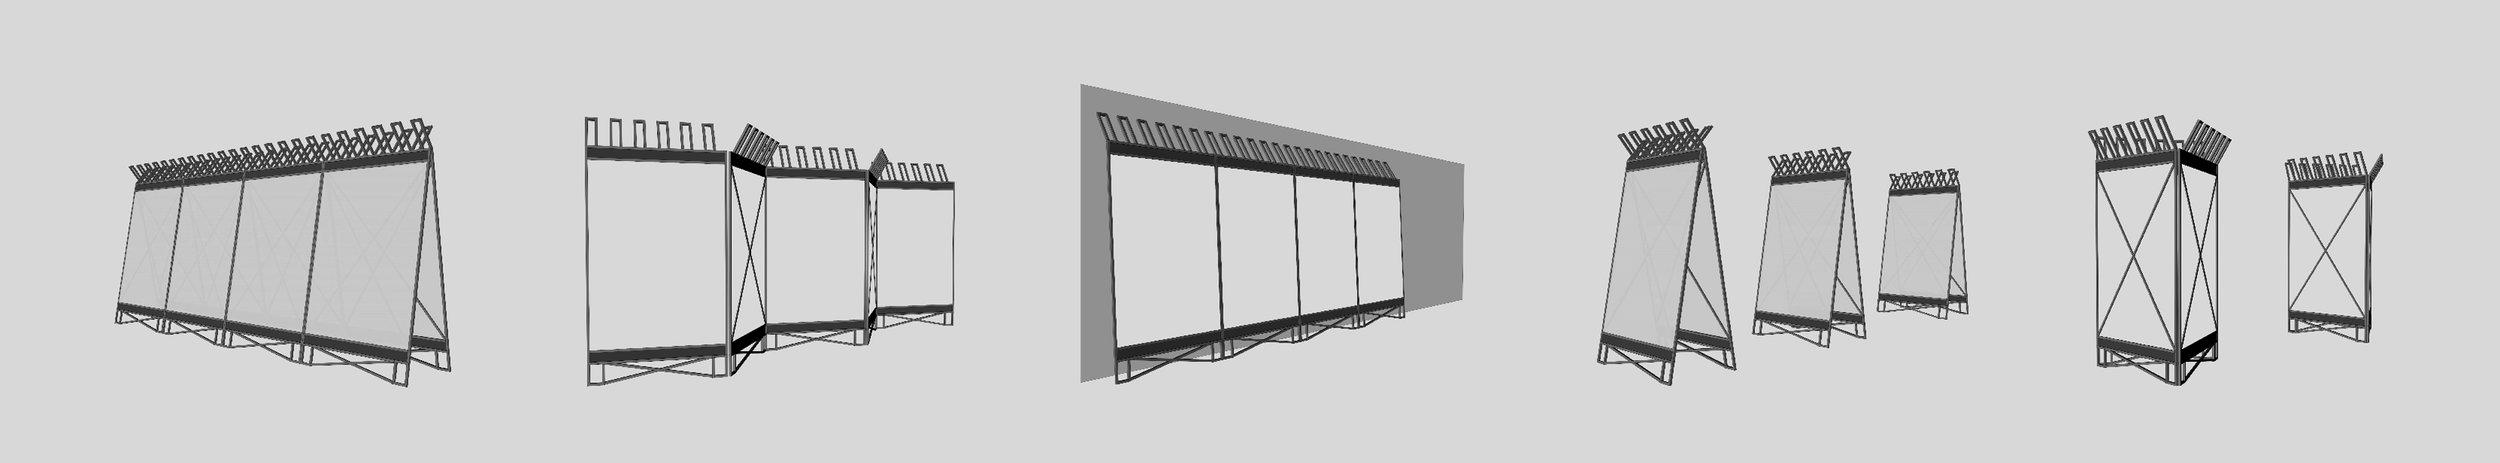 Sistemas-Exhibicion-01.jpg